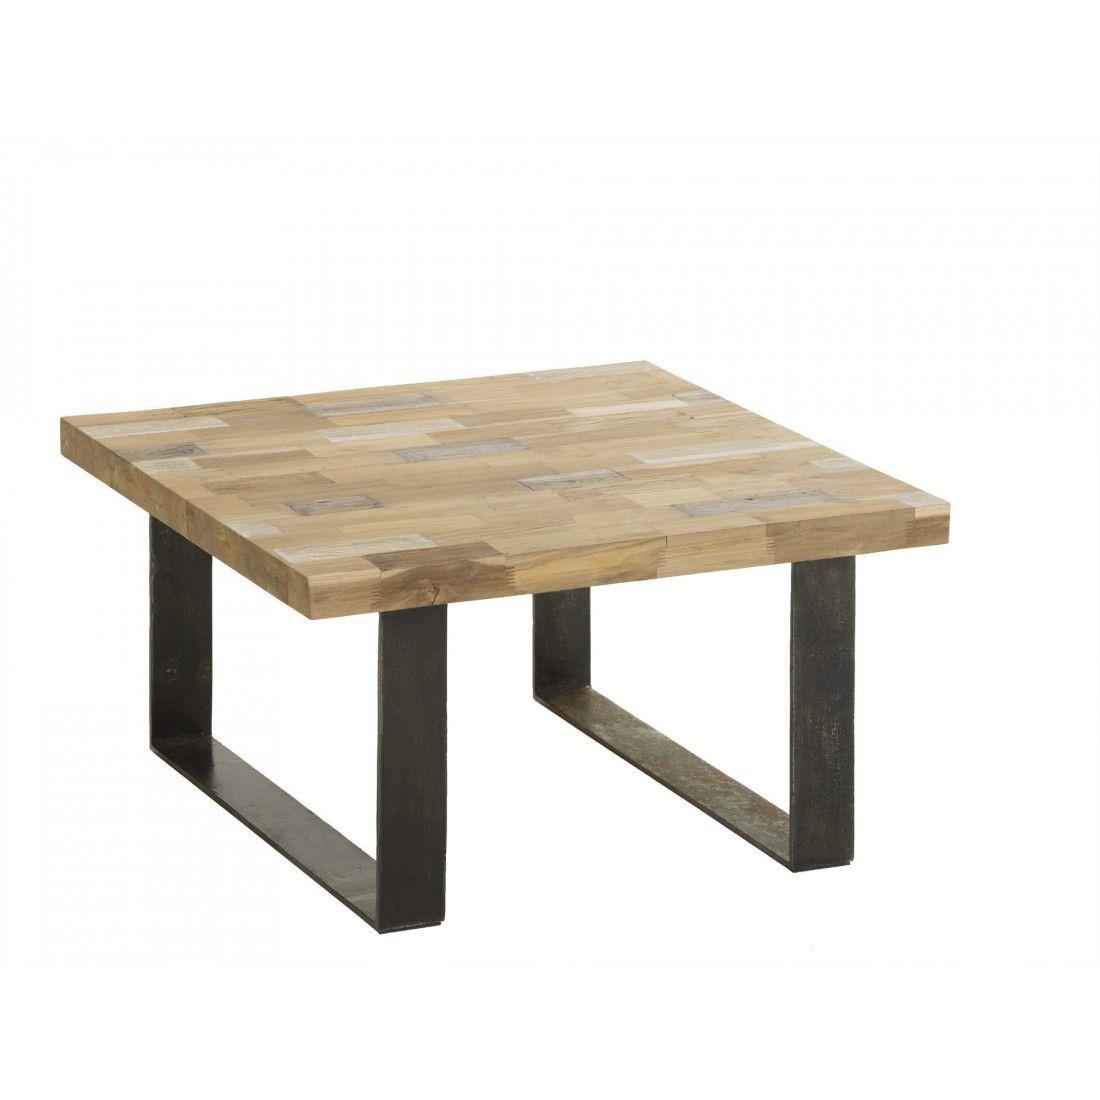 table basse mosaque en teck recycl pied mtal - Pied Pour Table Basse